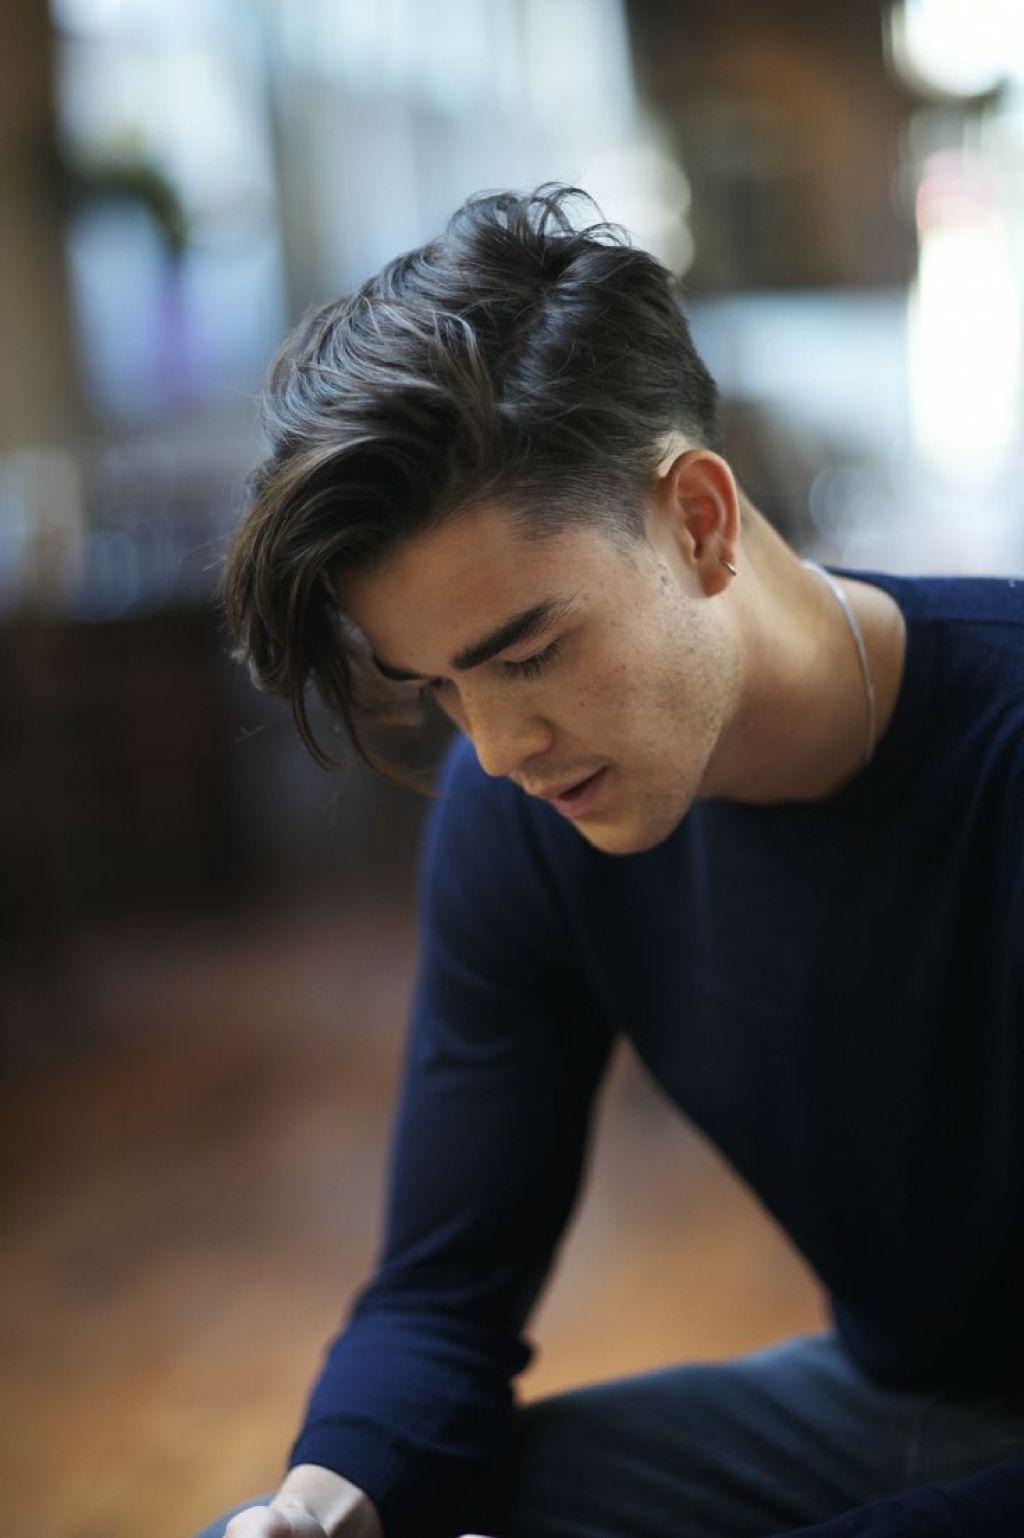 Mens short undercut haircut asiatische frisuren der männer asiatische frisuren der männer